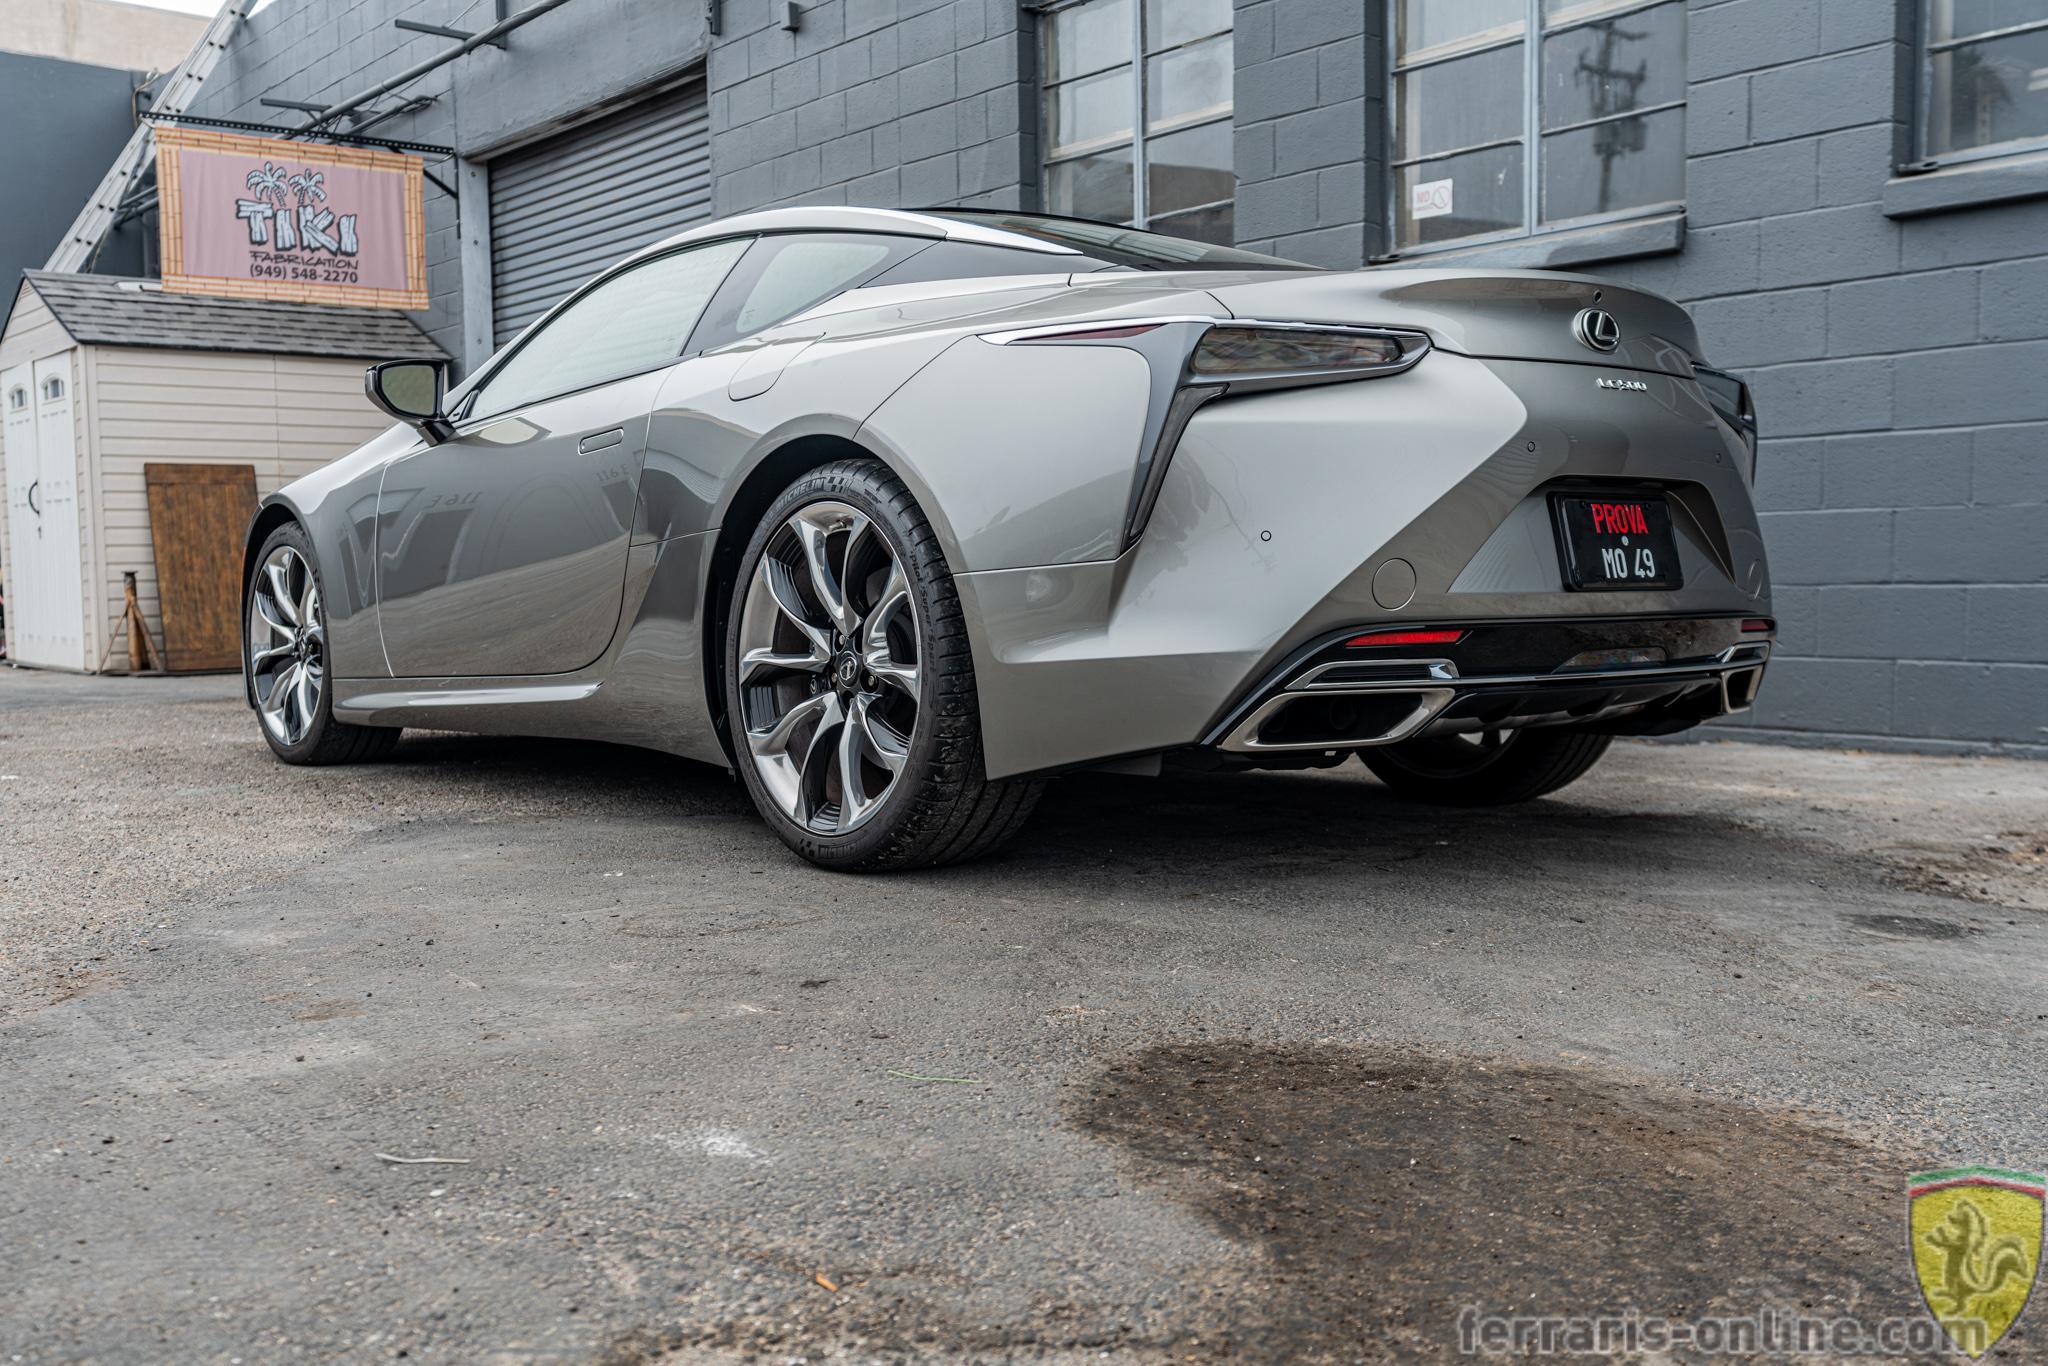 2019 Lexus LC500 #6315